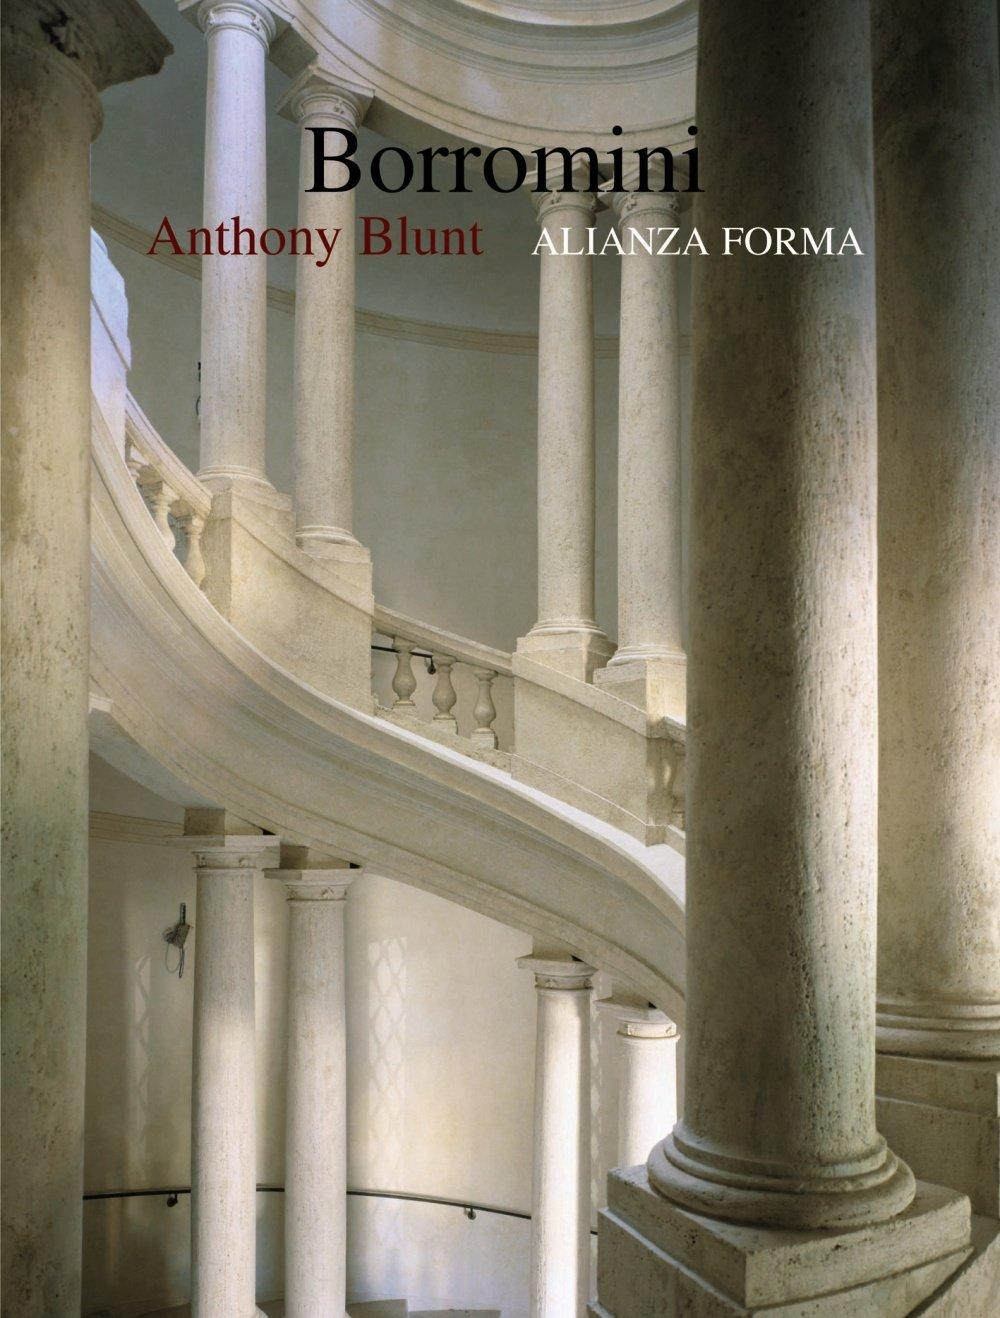 Borromini (Alianza Forma (Af)) Tapa blanda – 16 may 2005 Anthony Blunt Fernando Villaverde Landa 8420679658 Arquitectura barroca